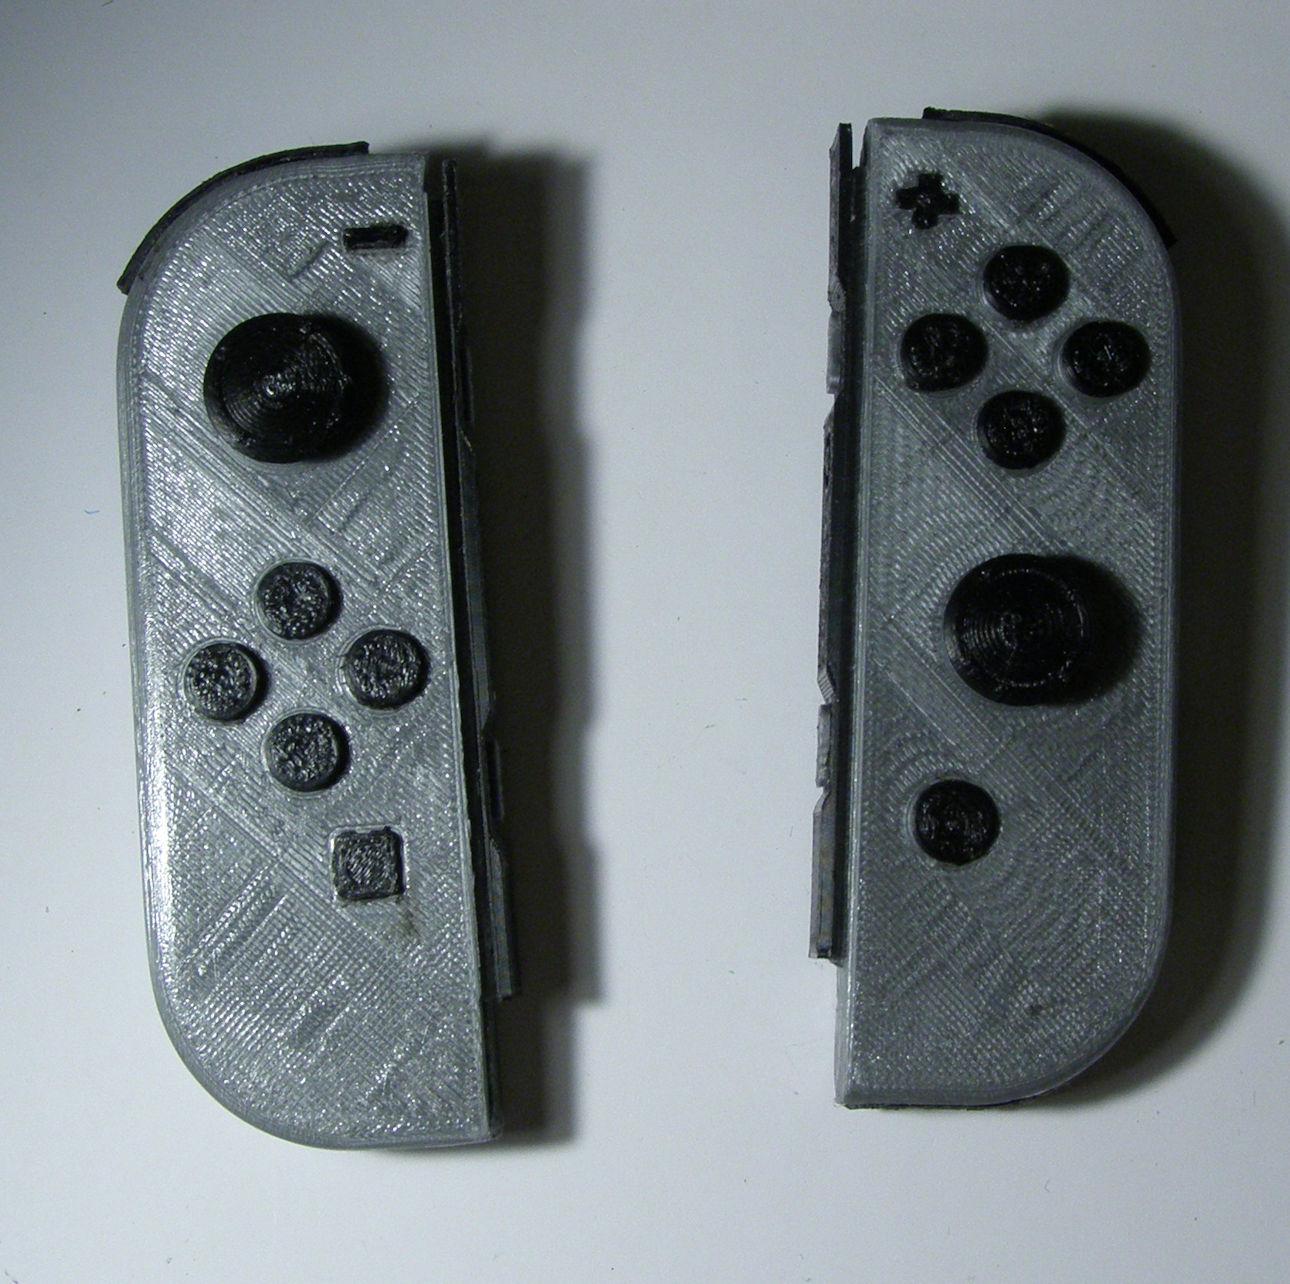 nintendo switch charging dock image